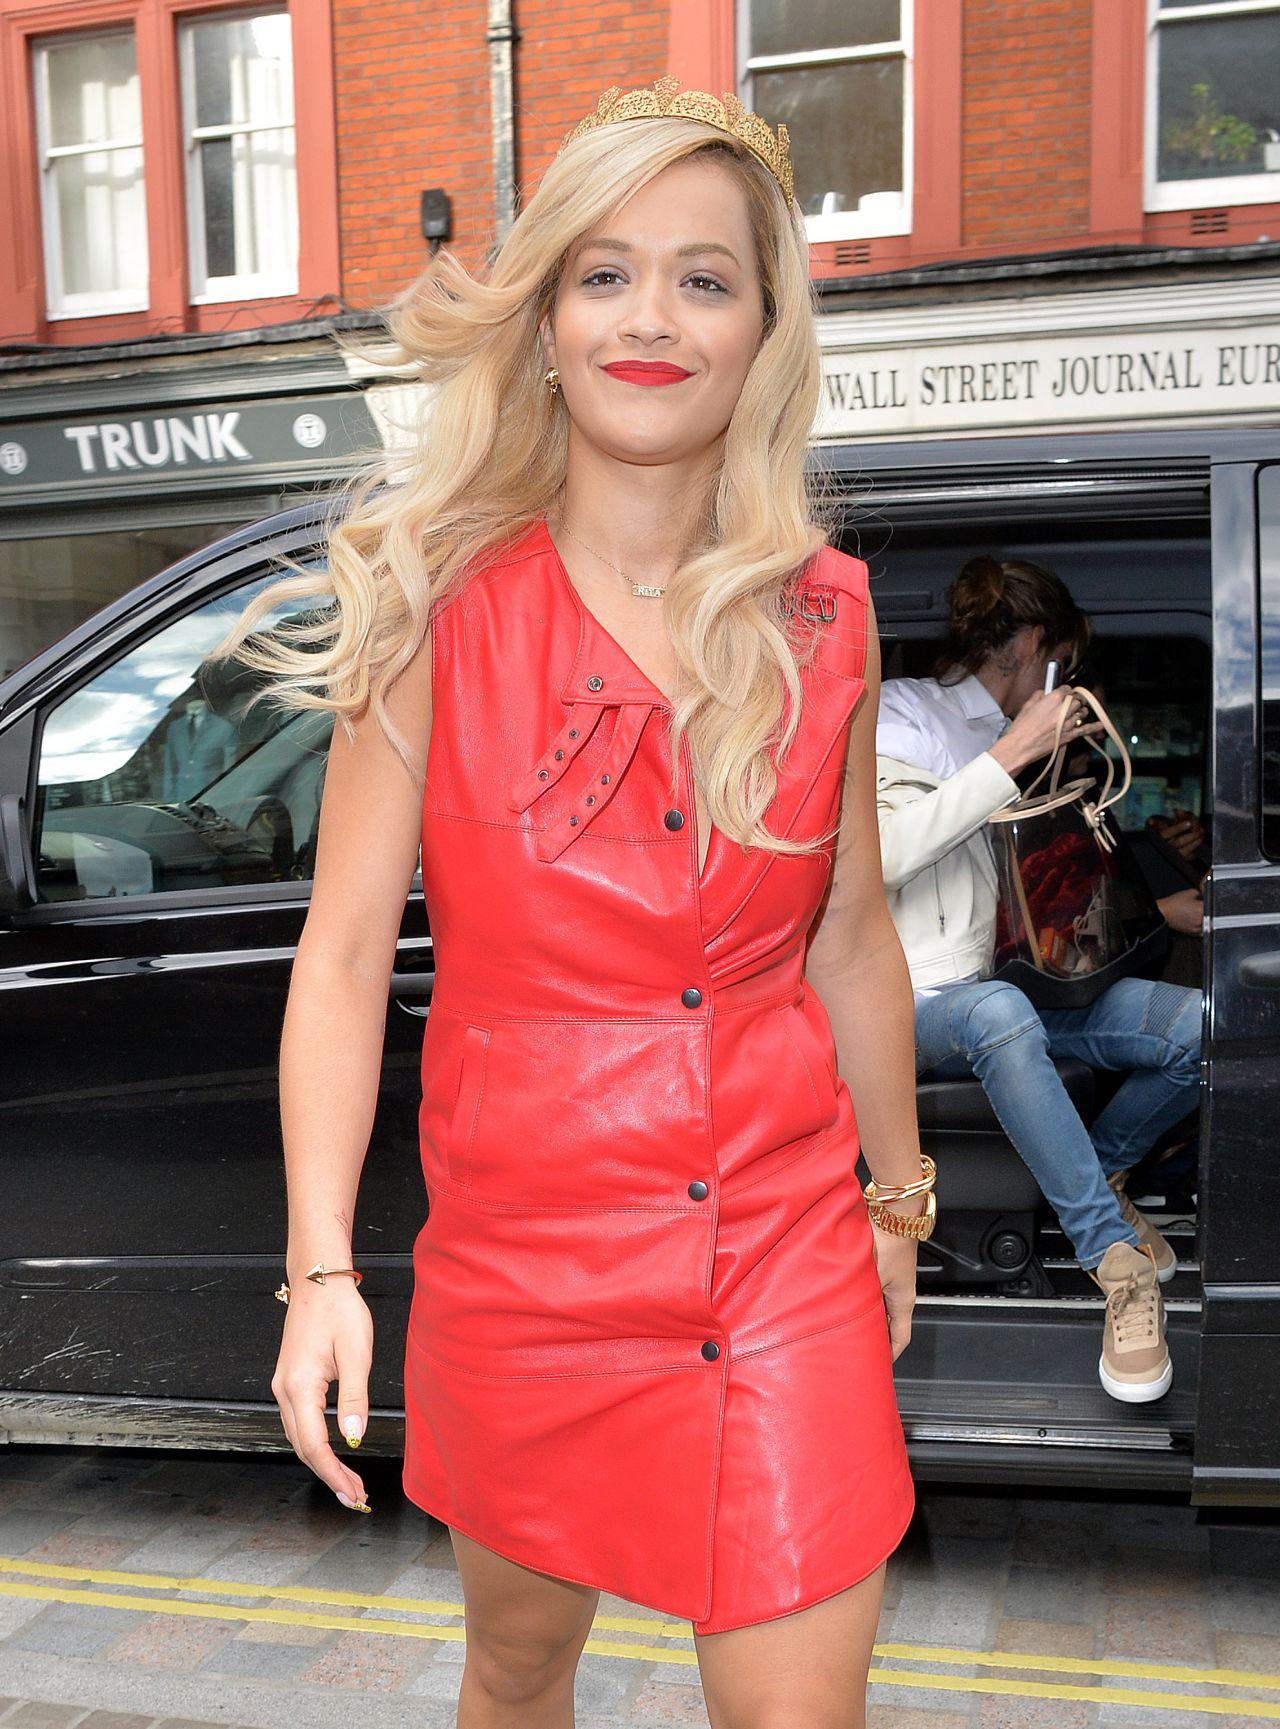 Rita Ora in Red Dress - Capital FM Studios in London - May 2014